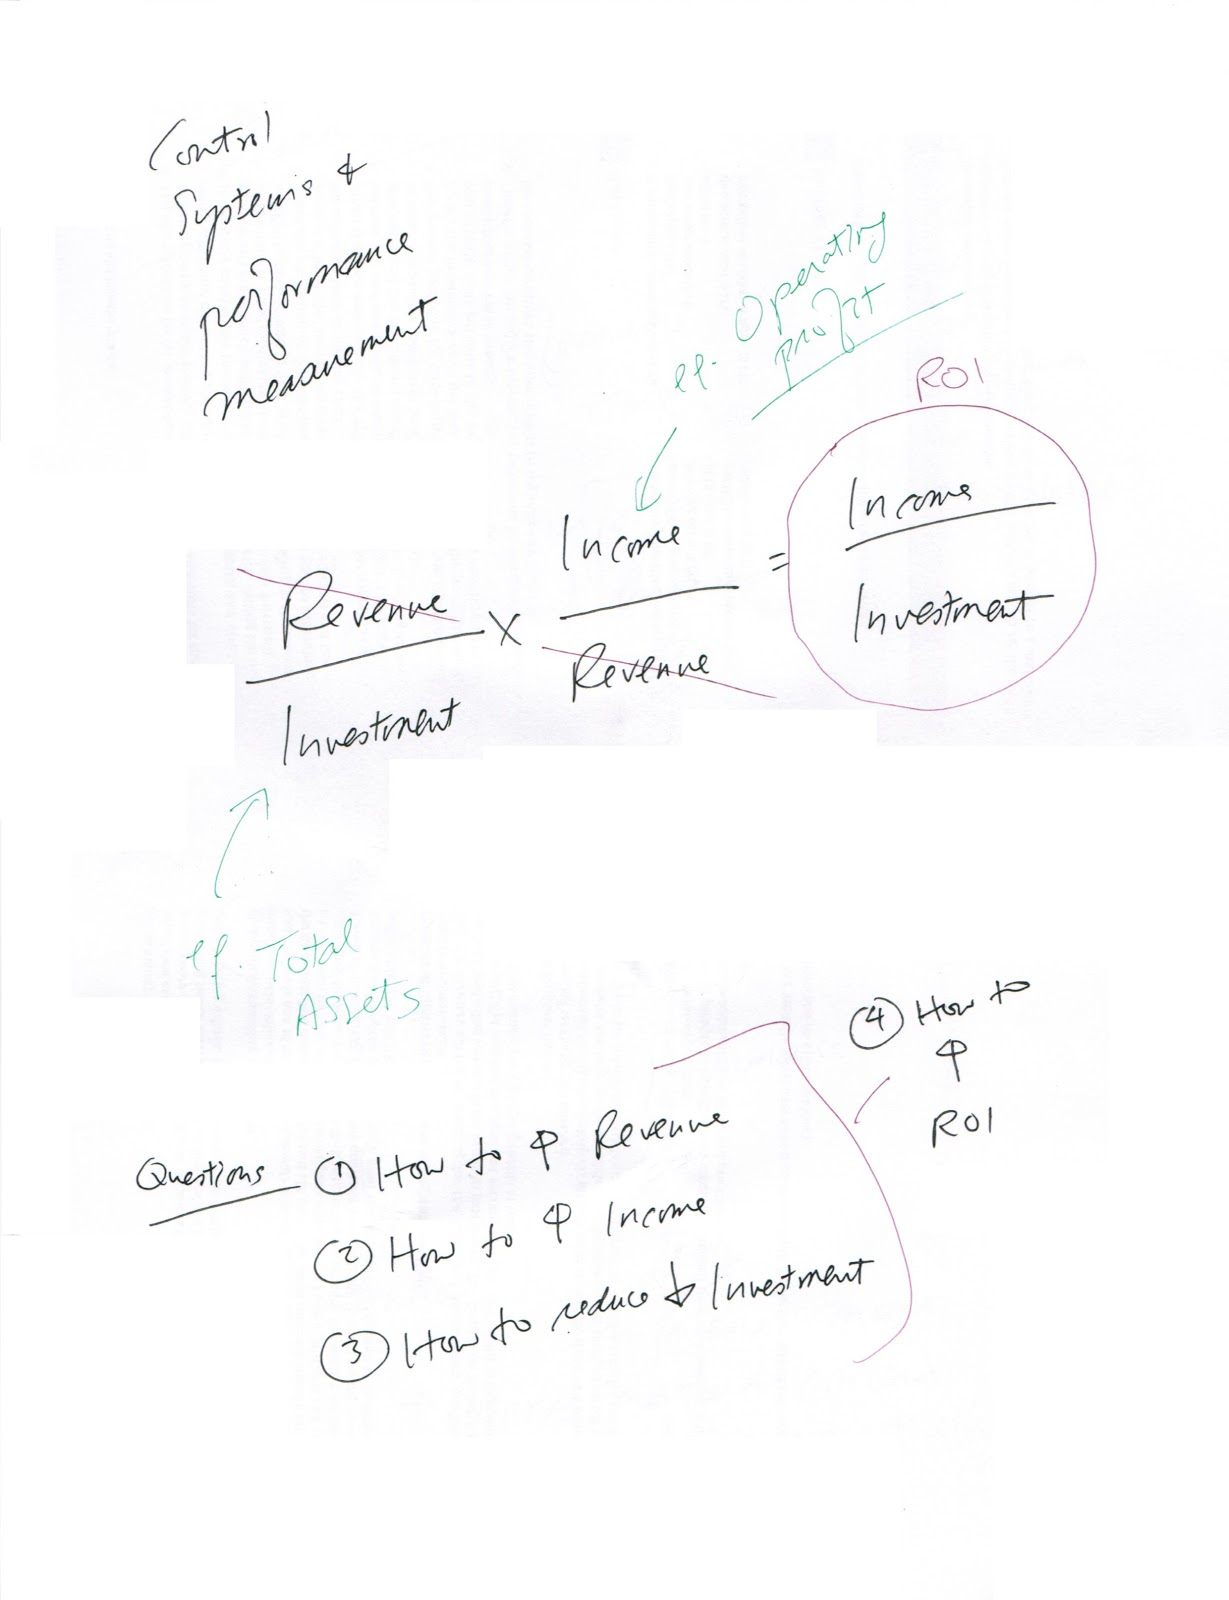 Joseph KK Ho e-resources: October 2012